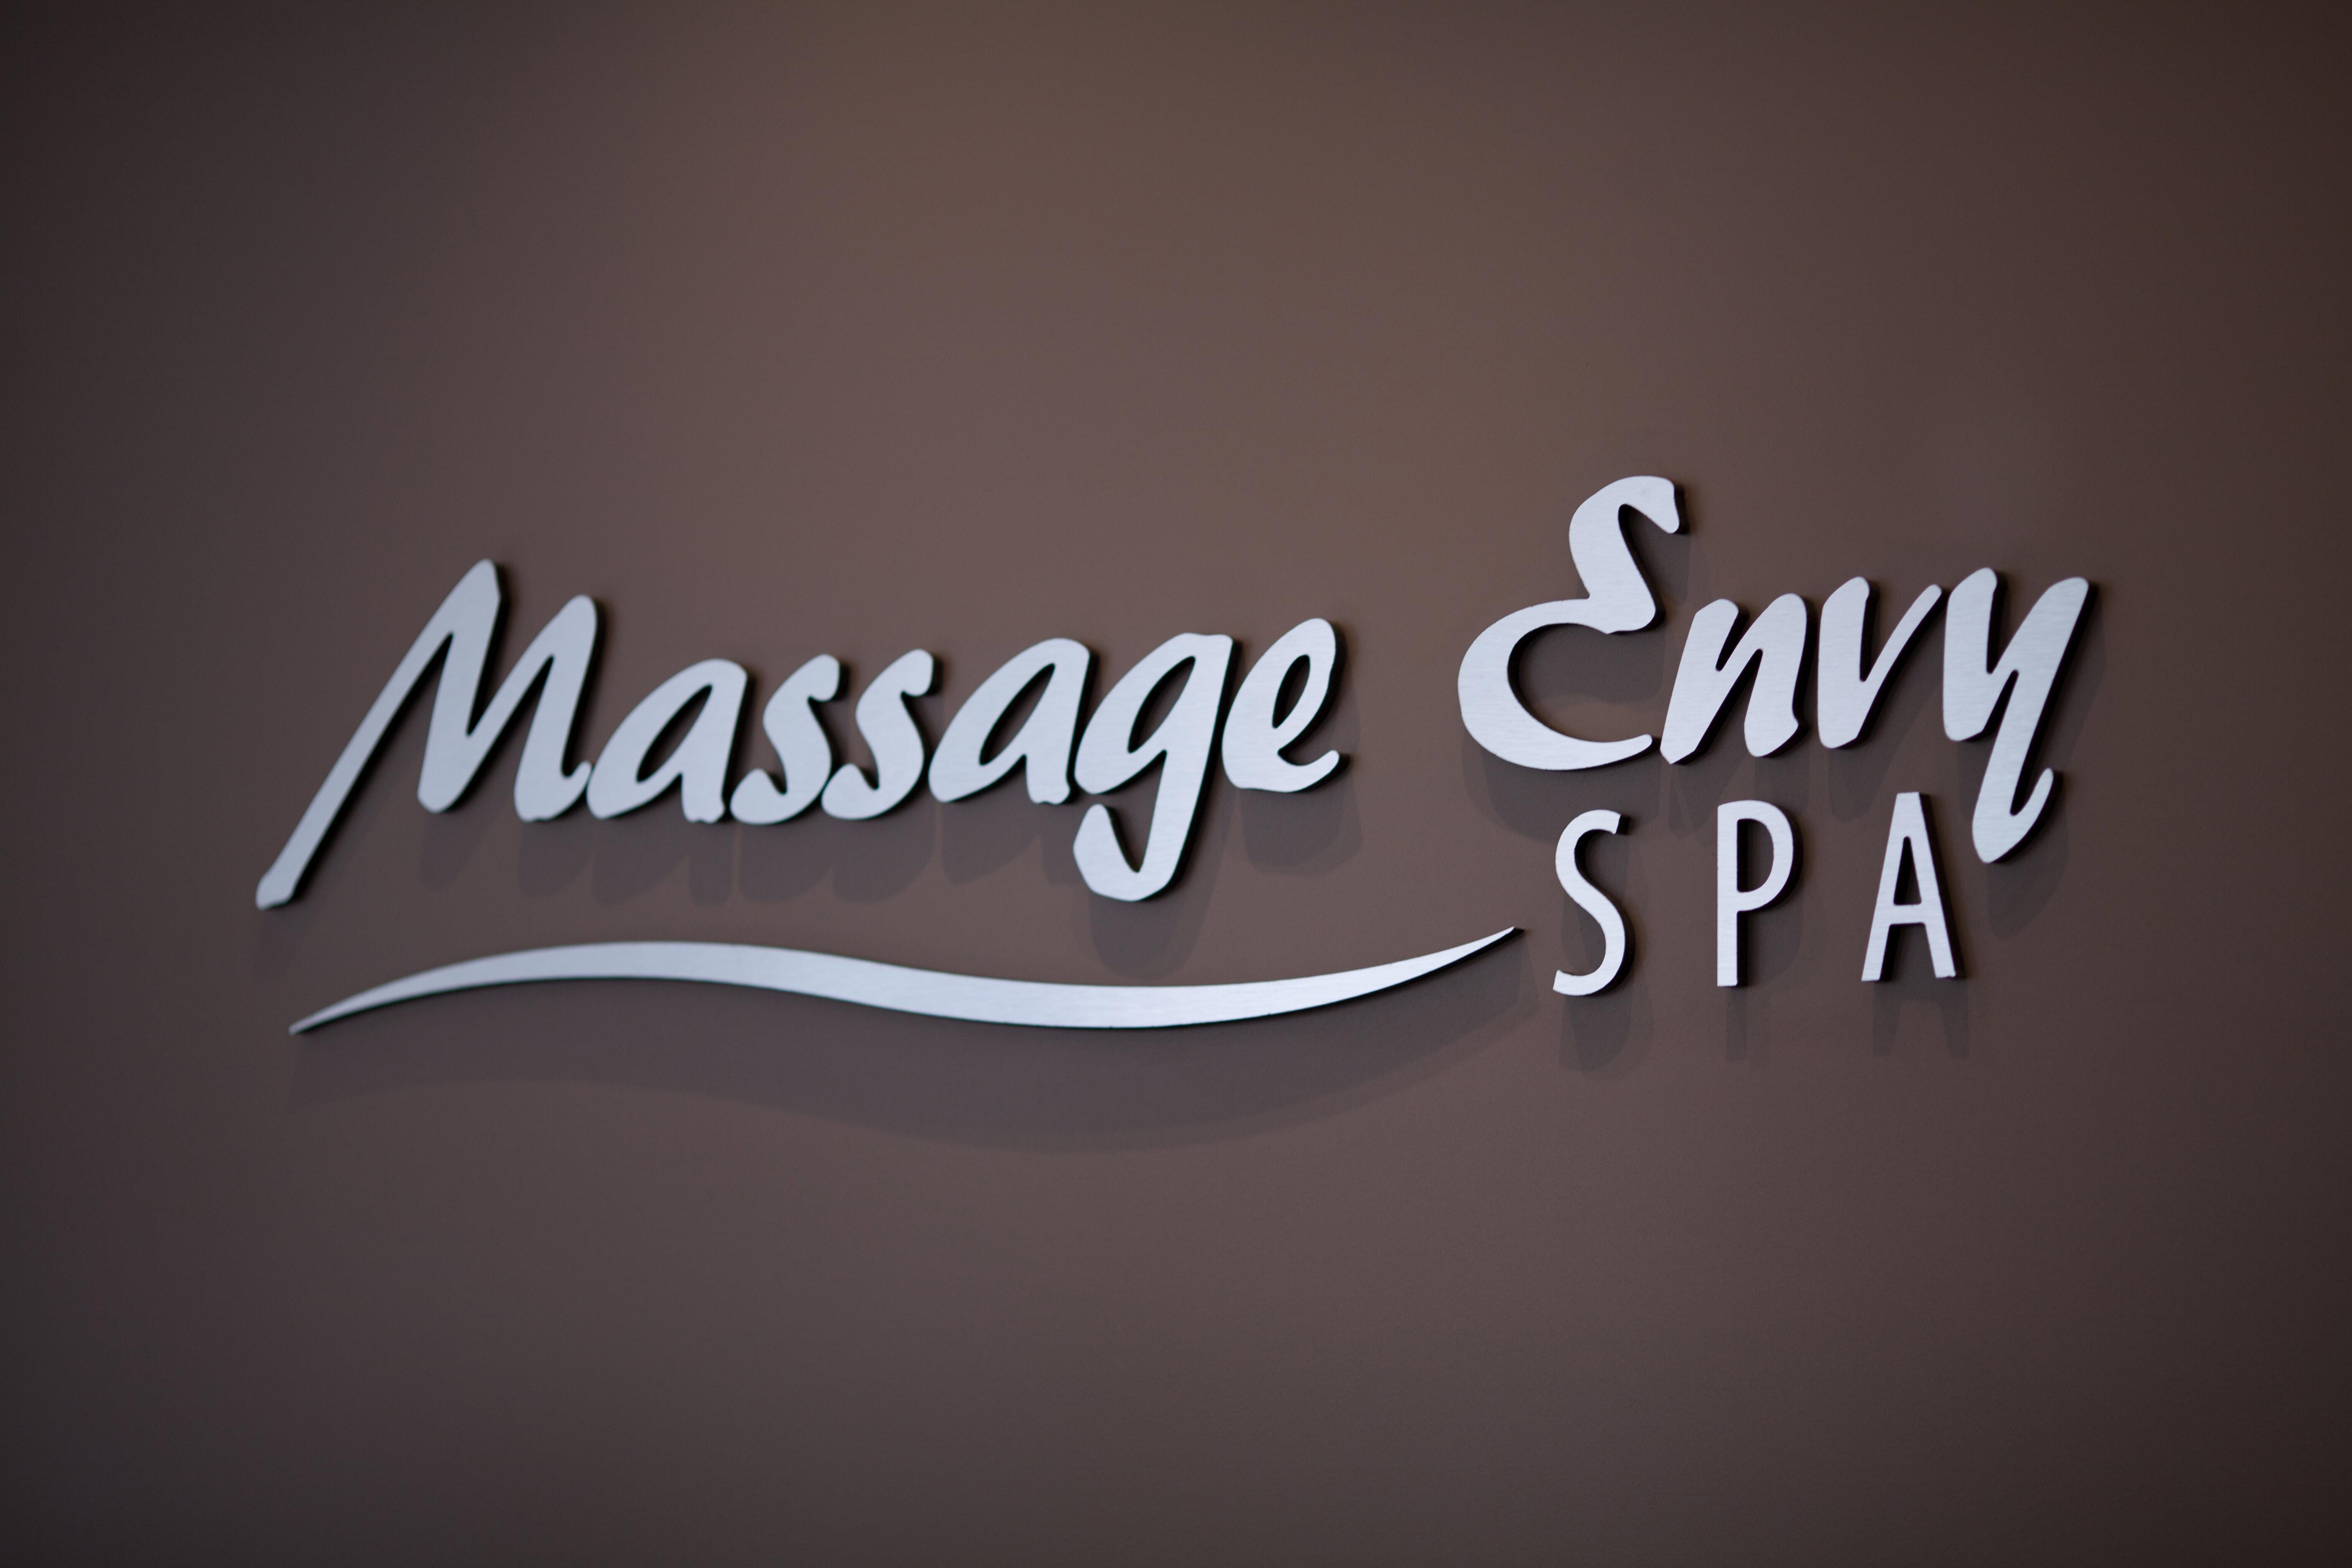 Massage Envy Spa - Broad Ripple